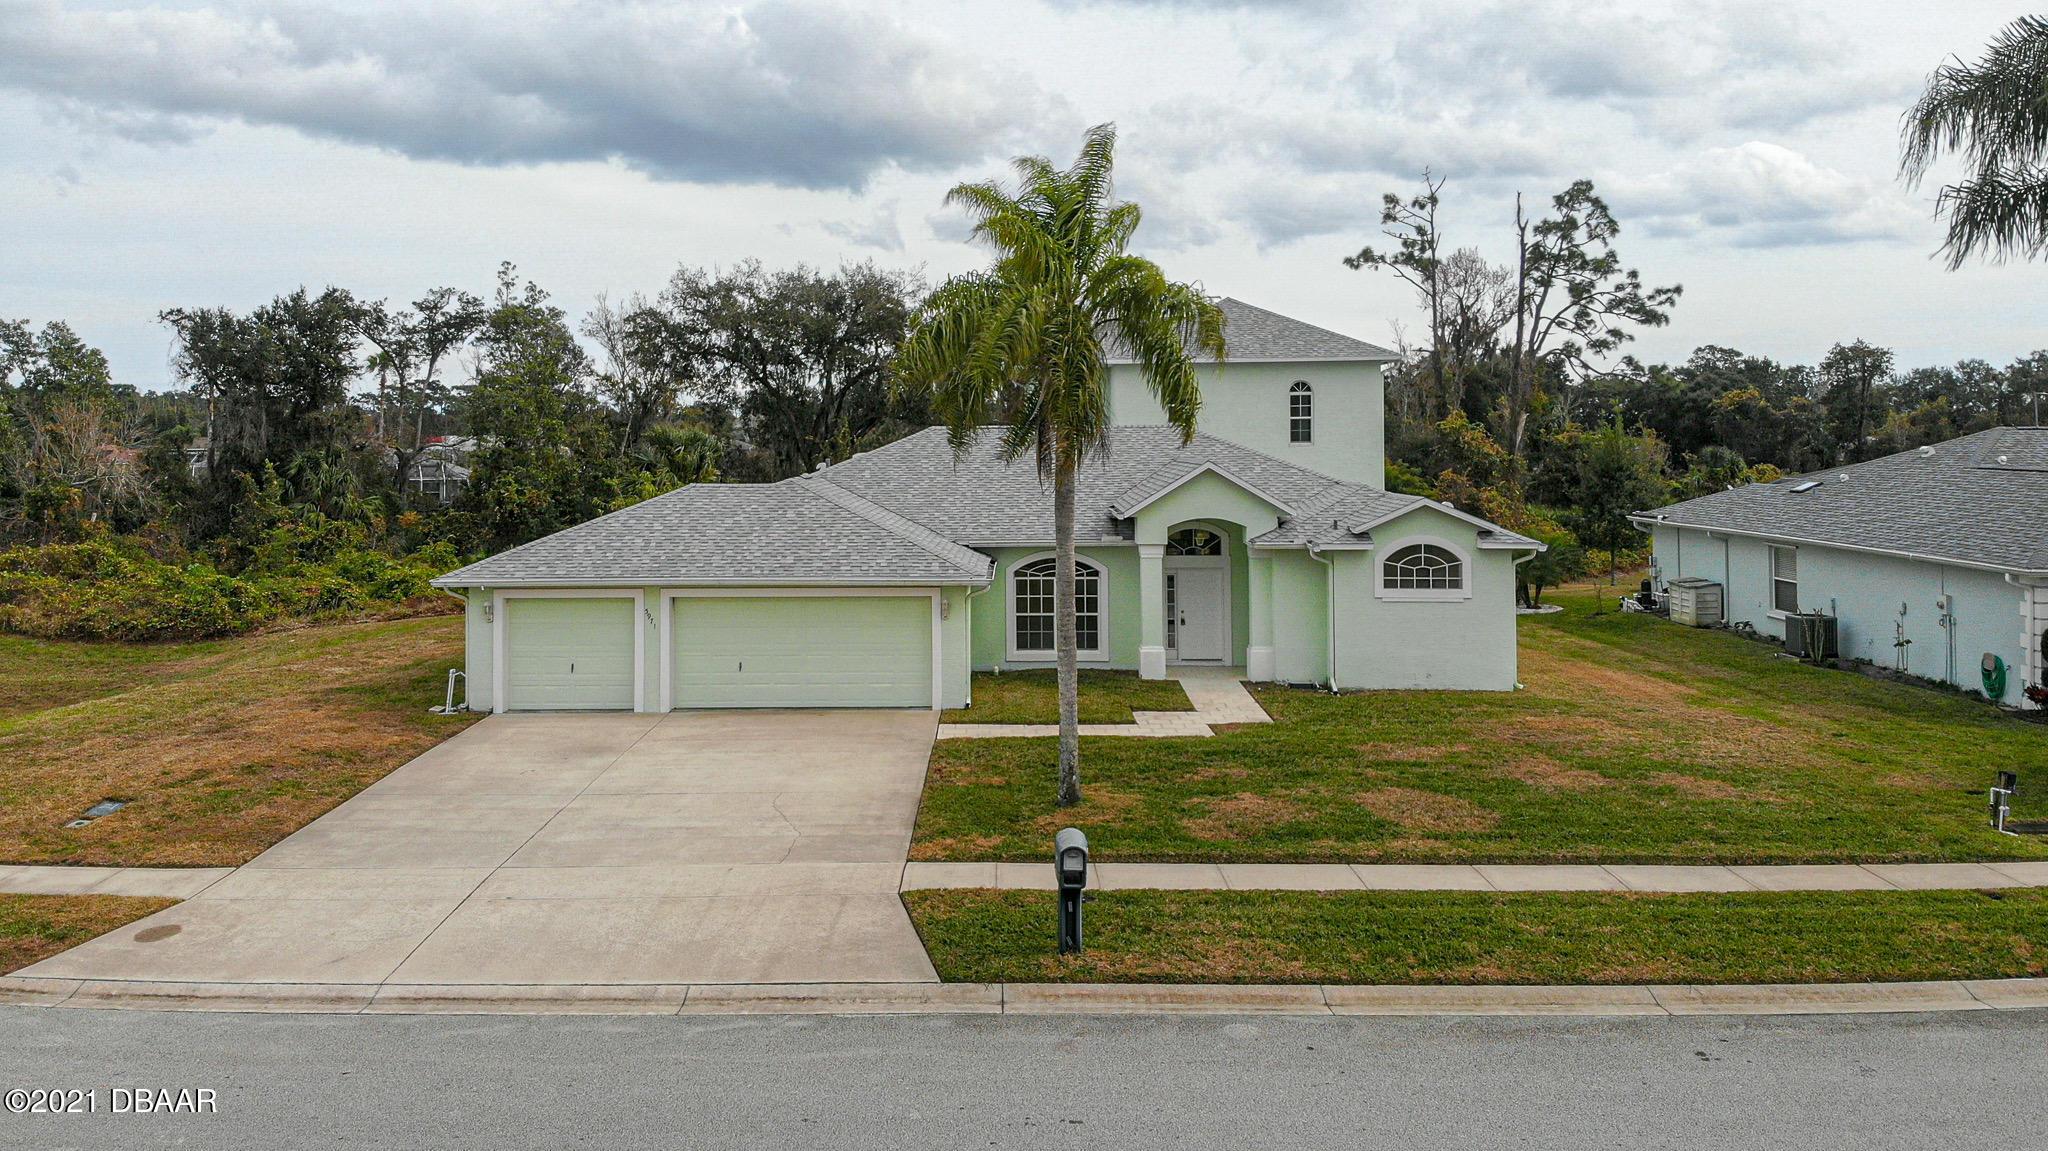 Photo of 5971 Sawgrass Point Drive, Port Orange, FL 32128